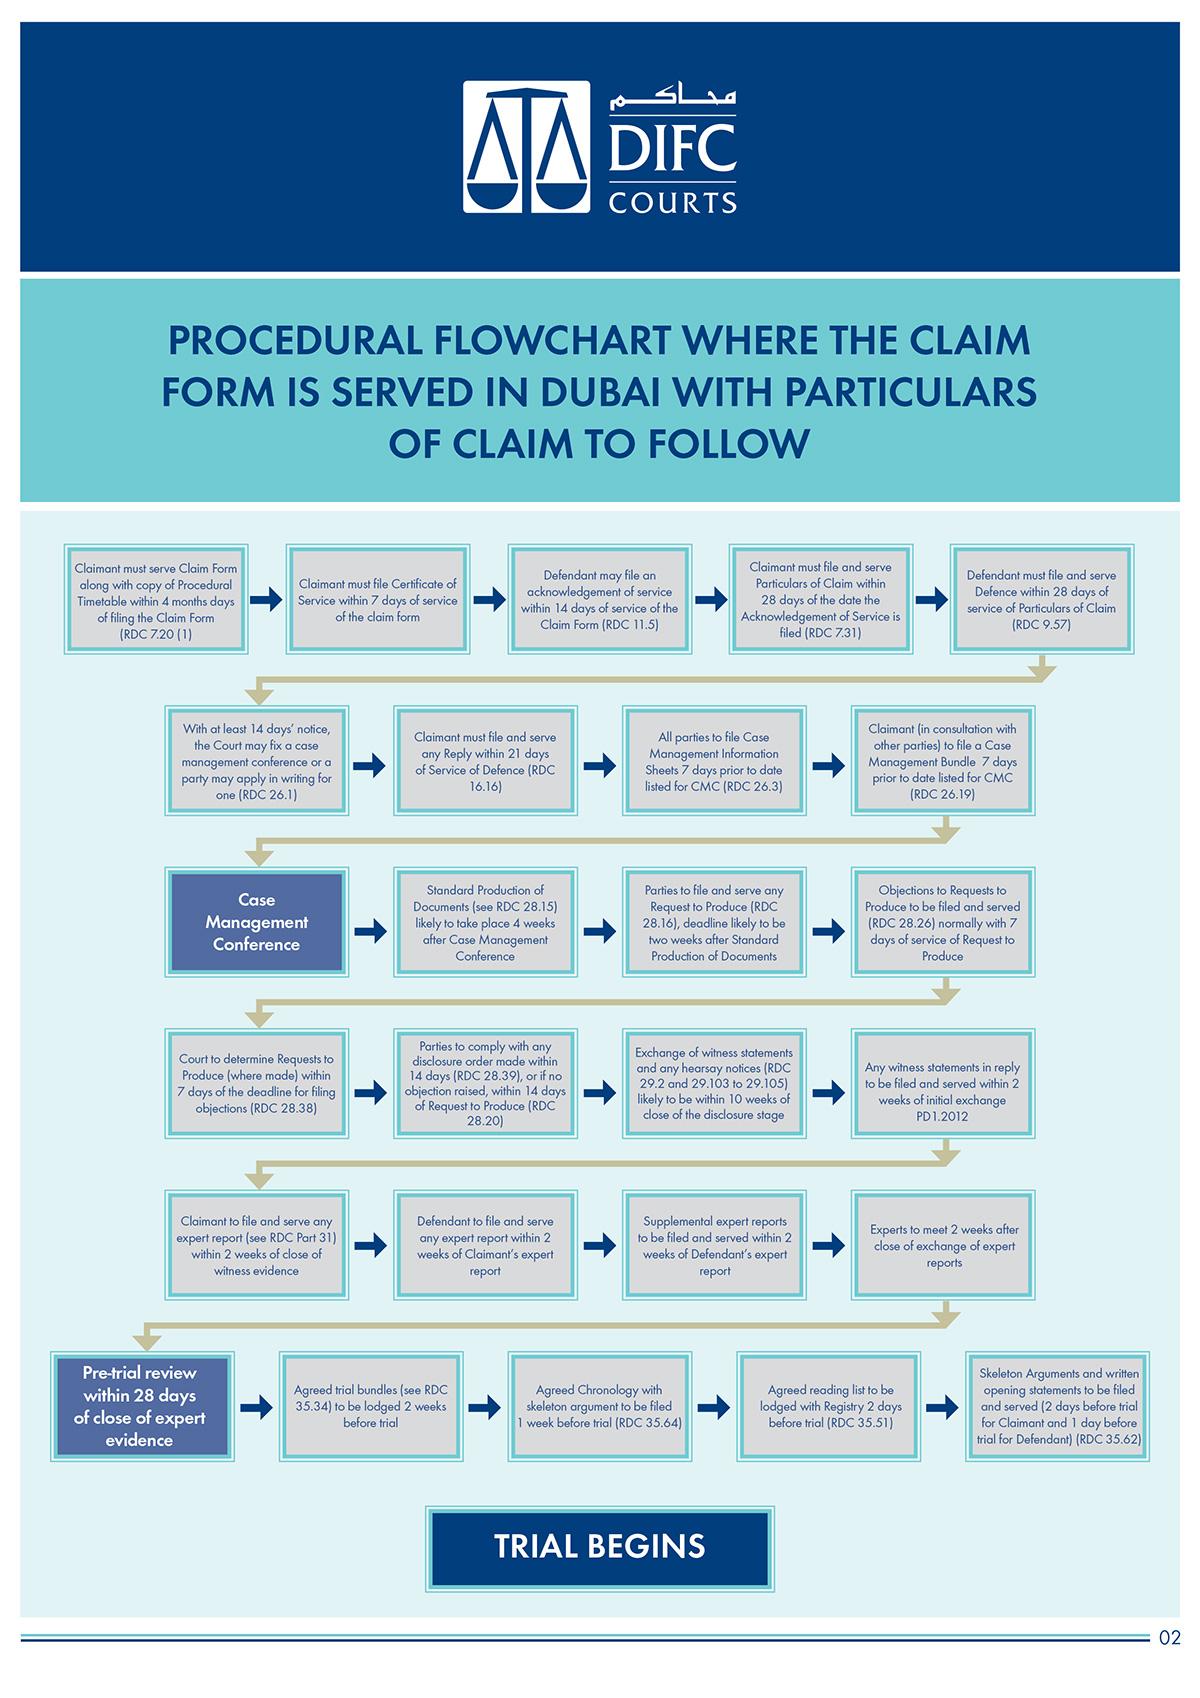 difc-case-progression-flow-charts-3.jpg